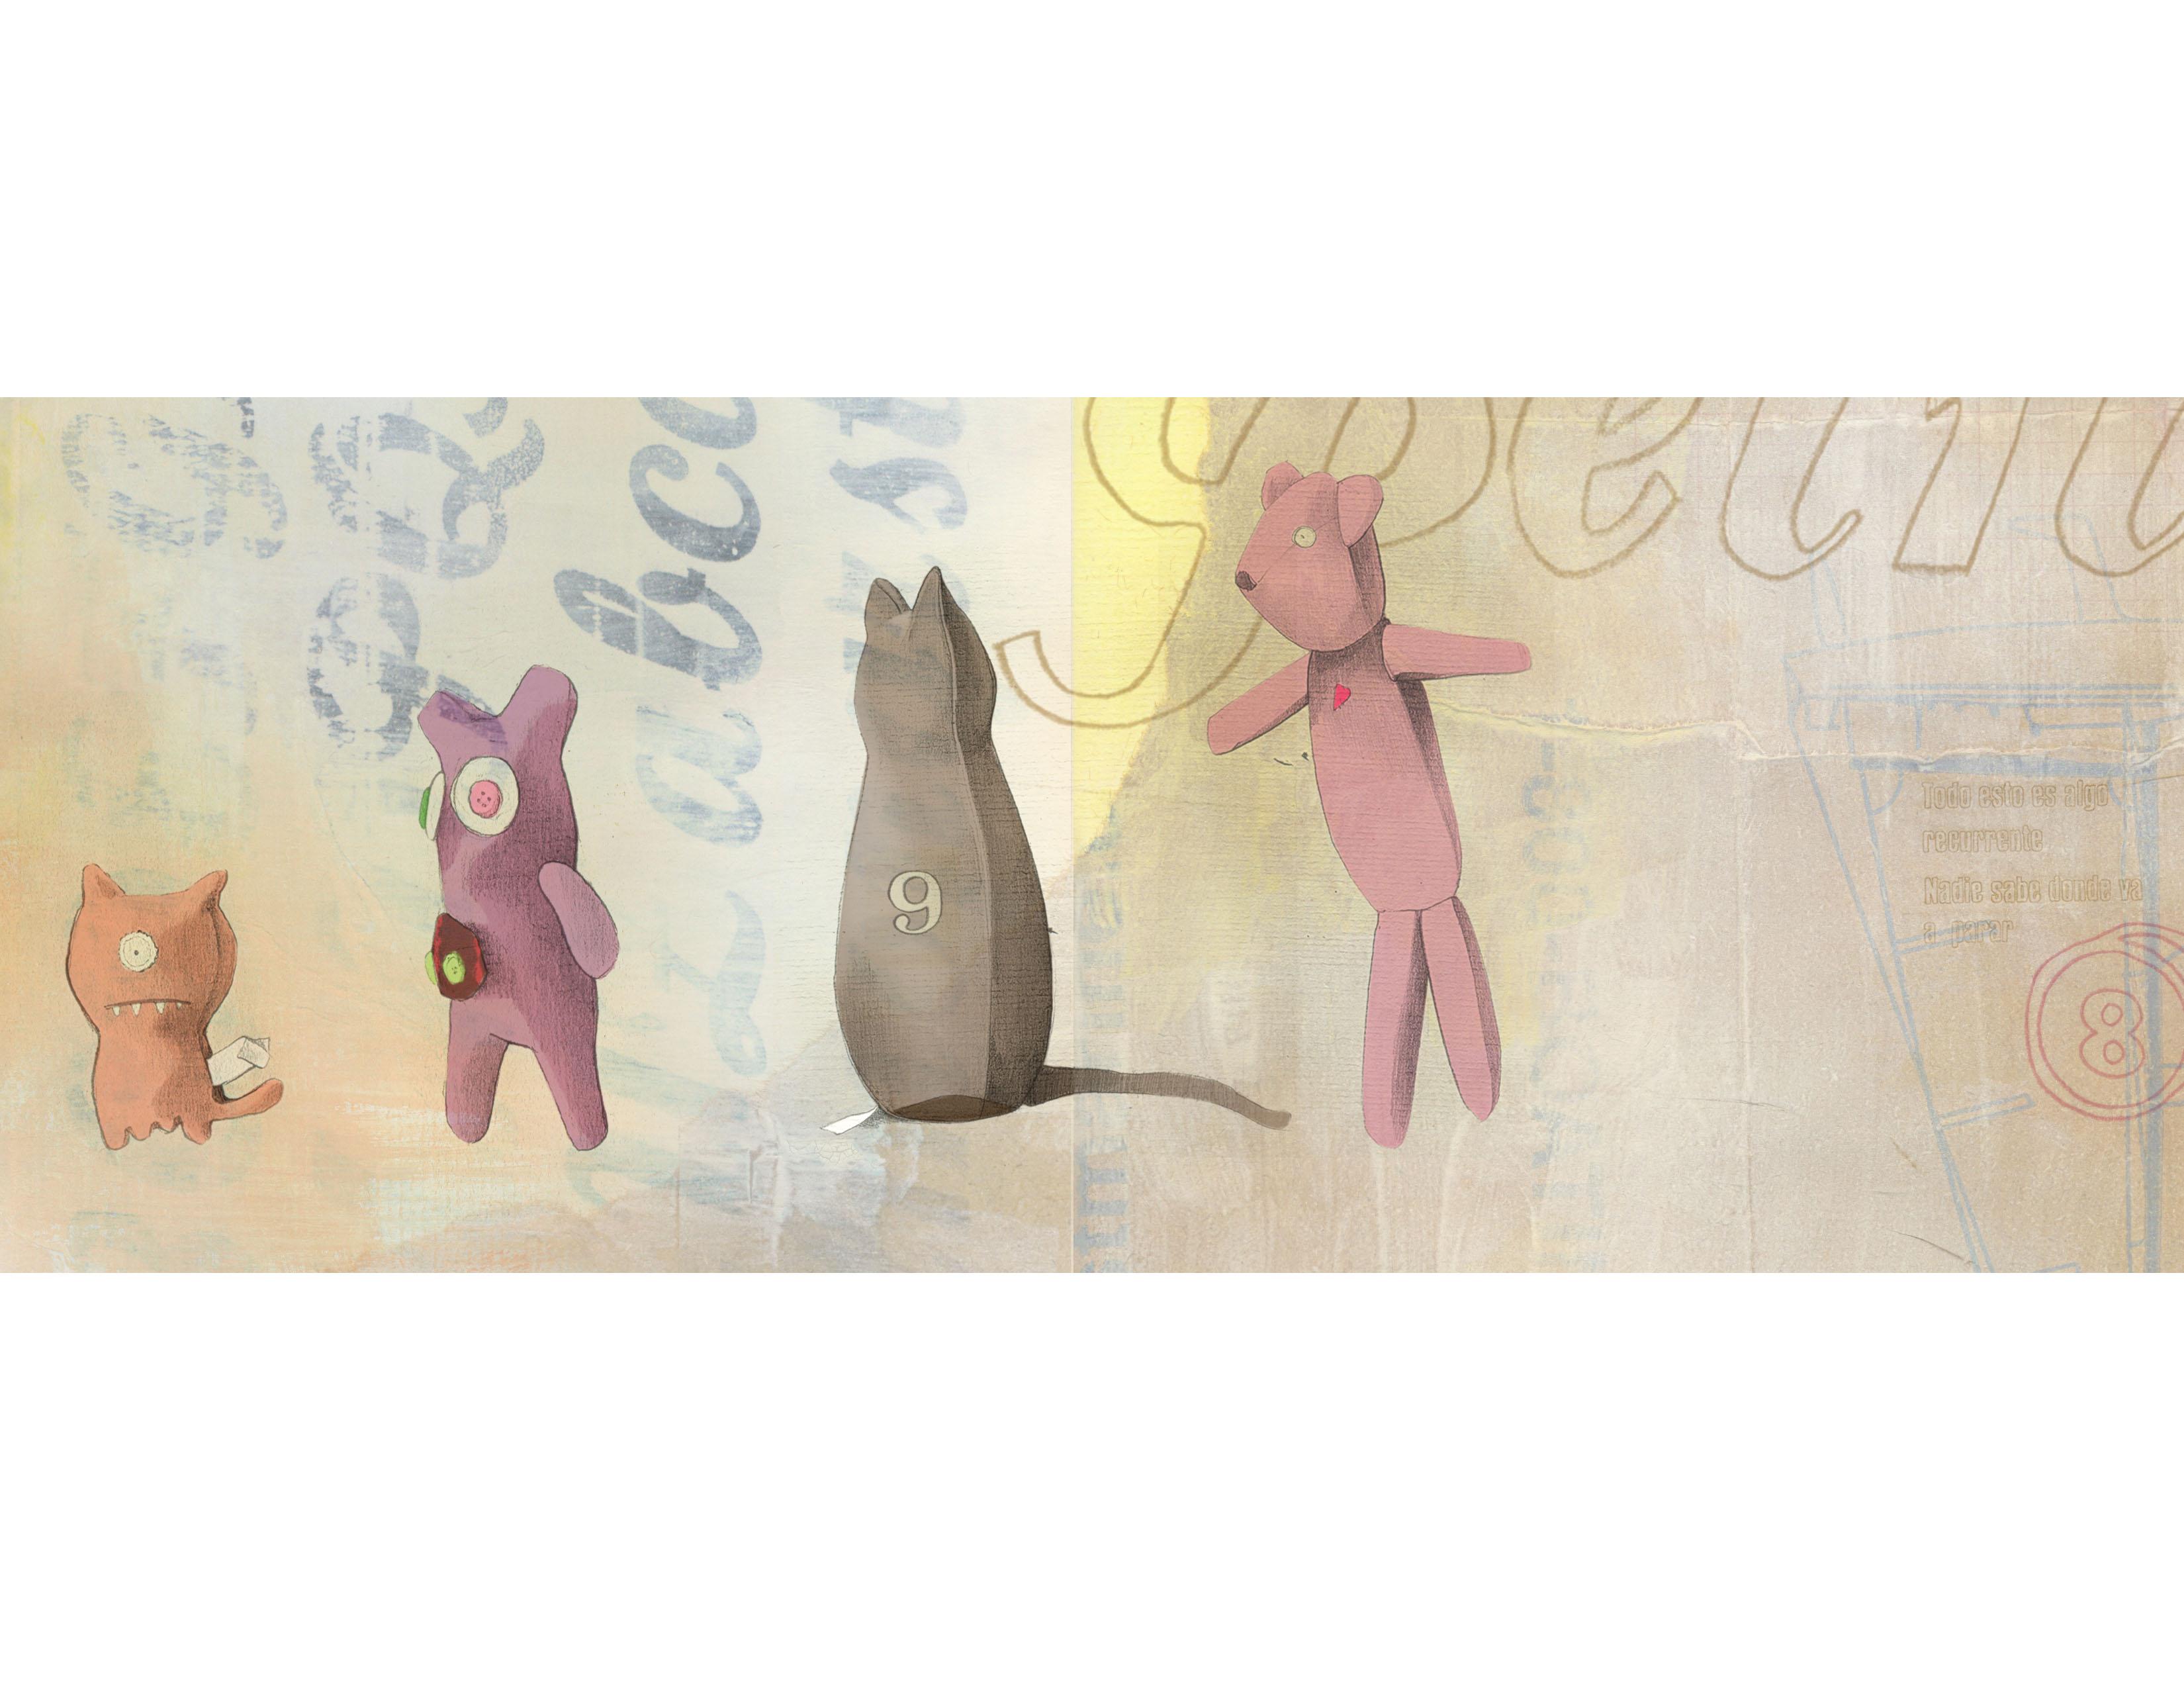 Ilustracion Dibujo By Maria Carolina Ramirez Alvarez At